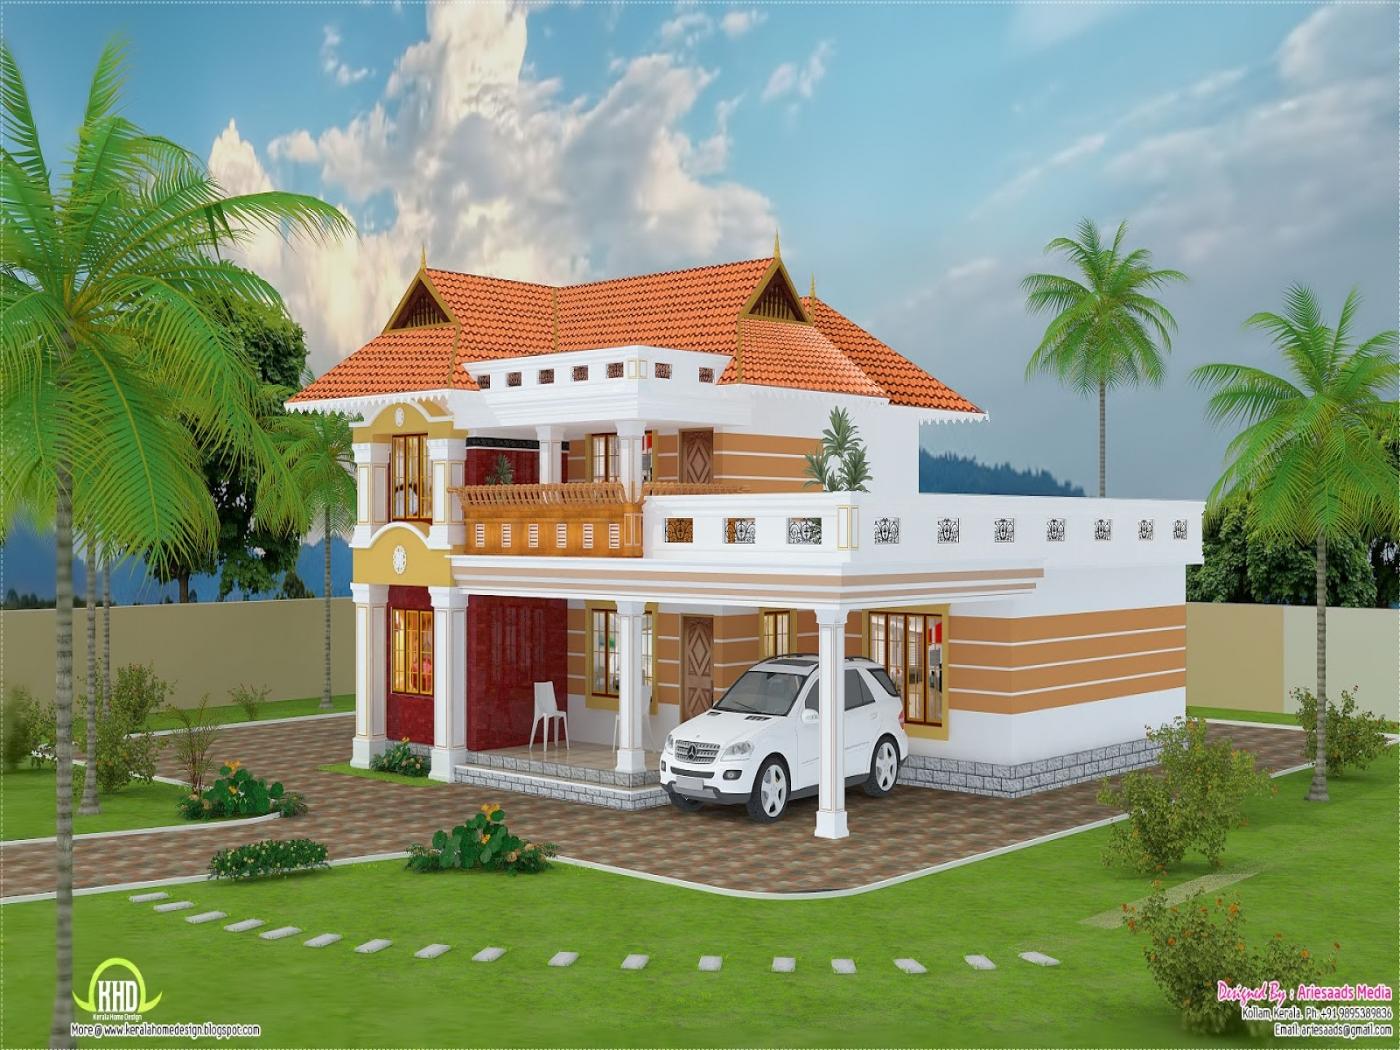 Beautiful Villa Desktop Wallpaper Wallpapersafari